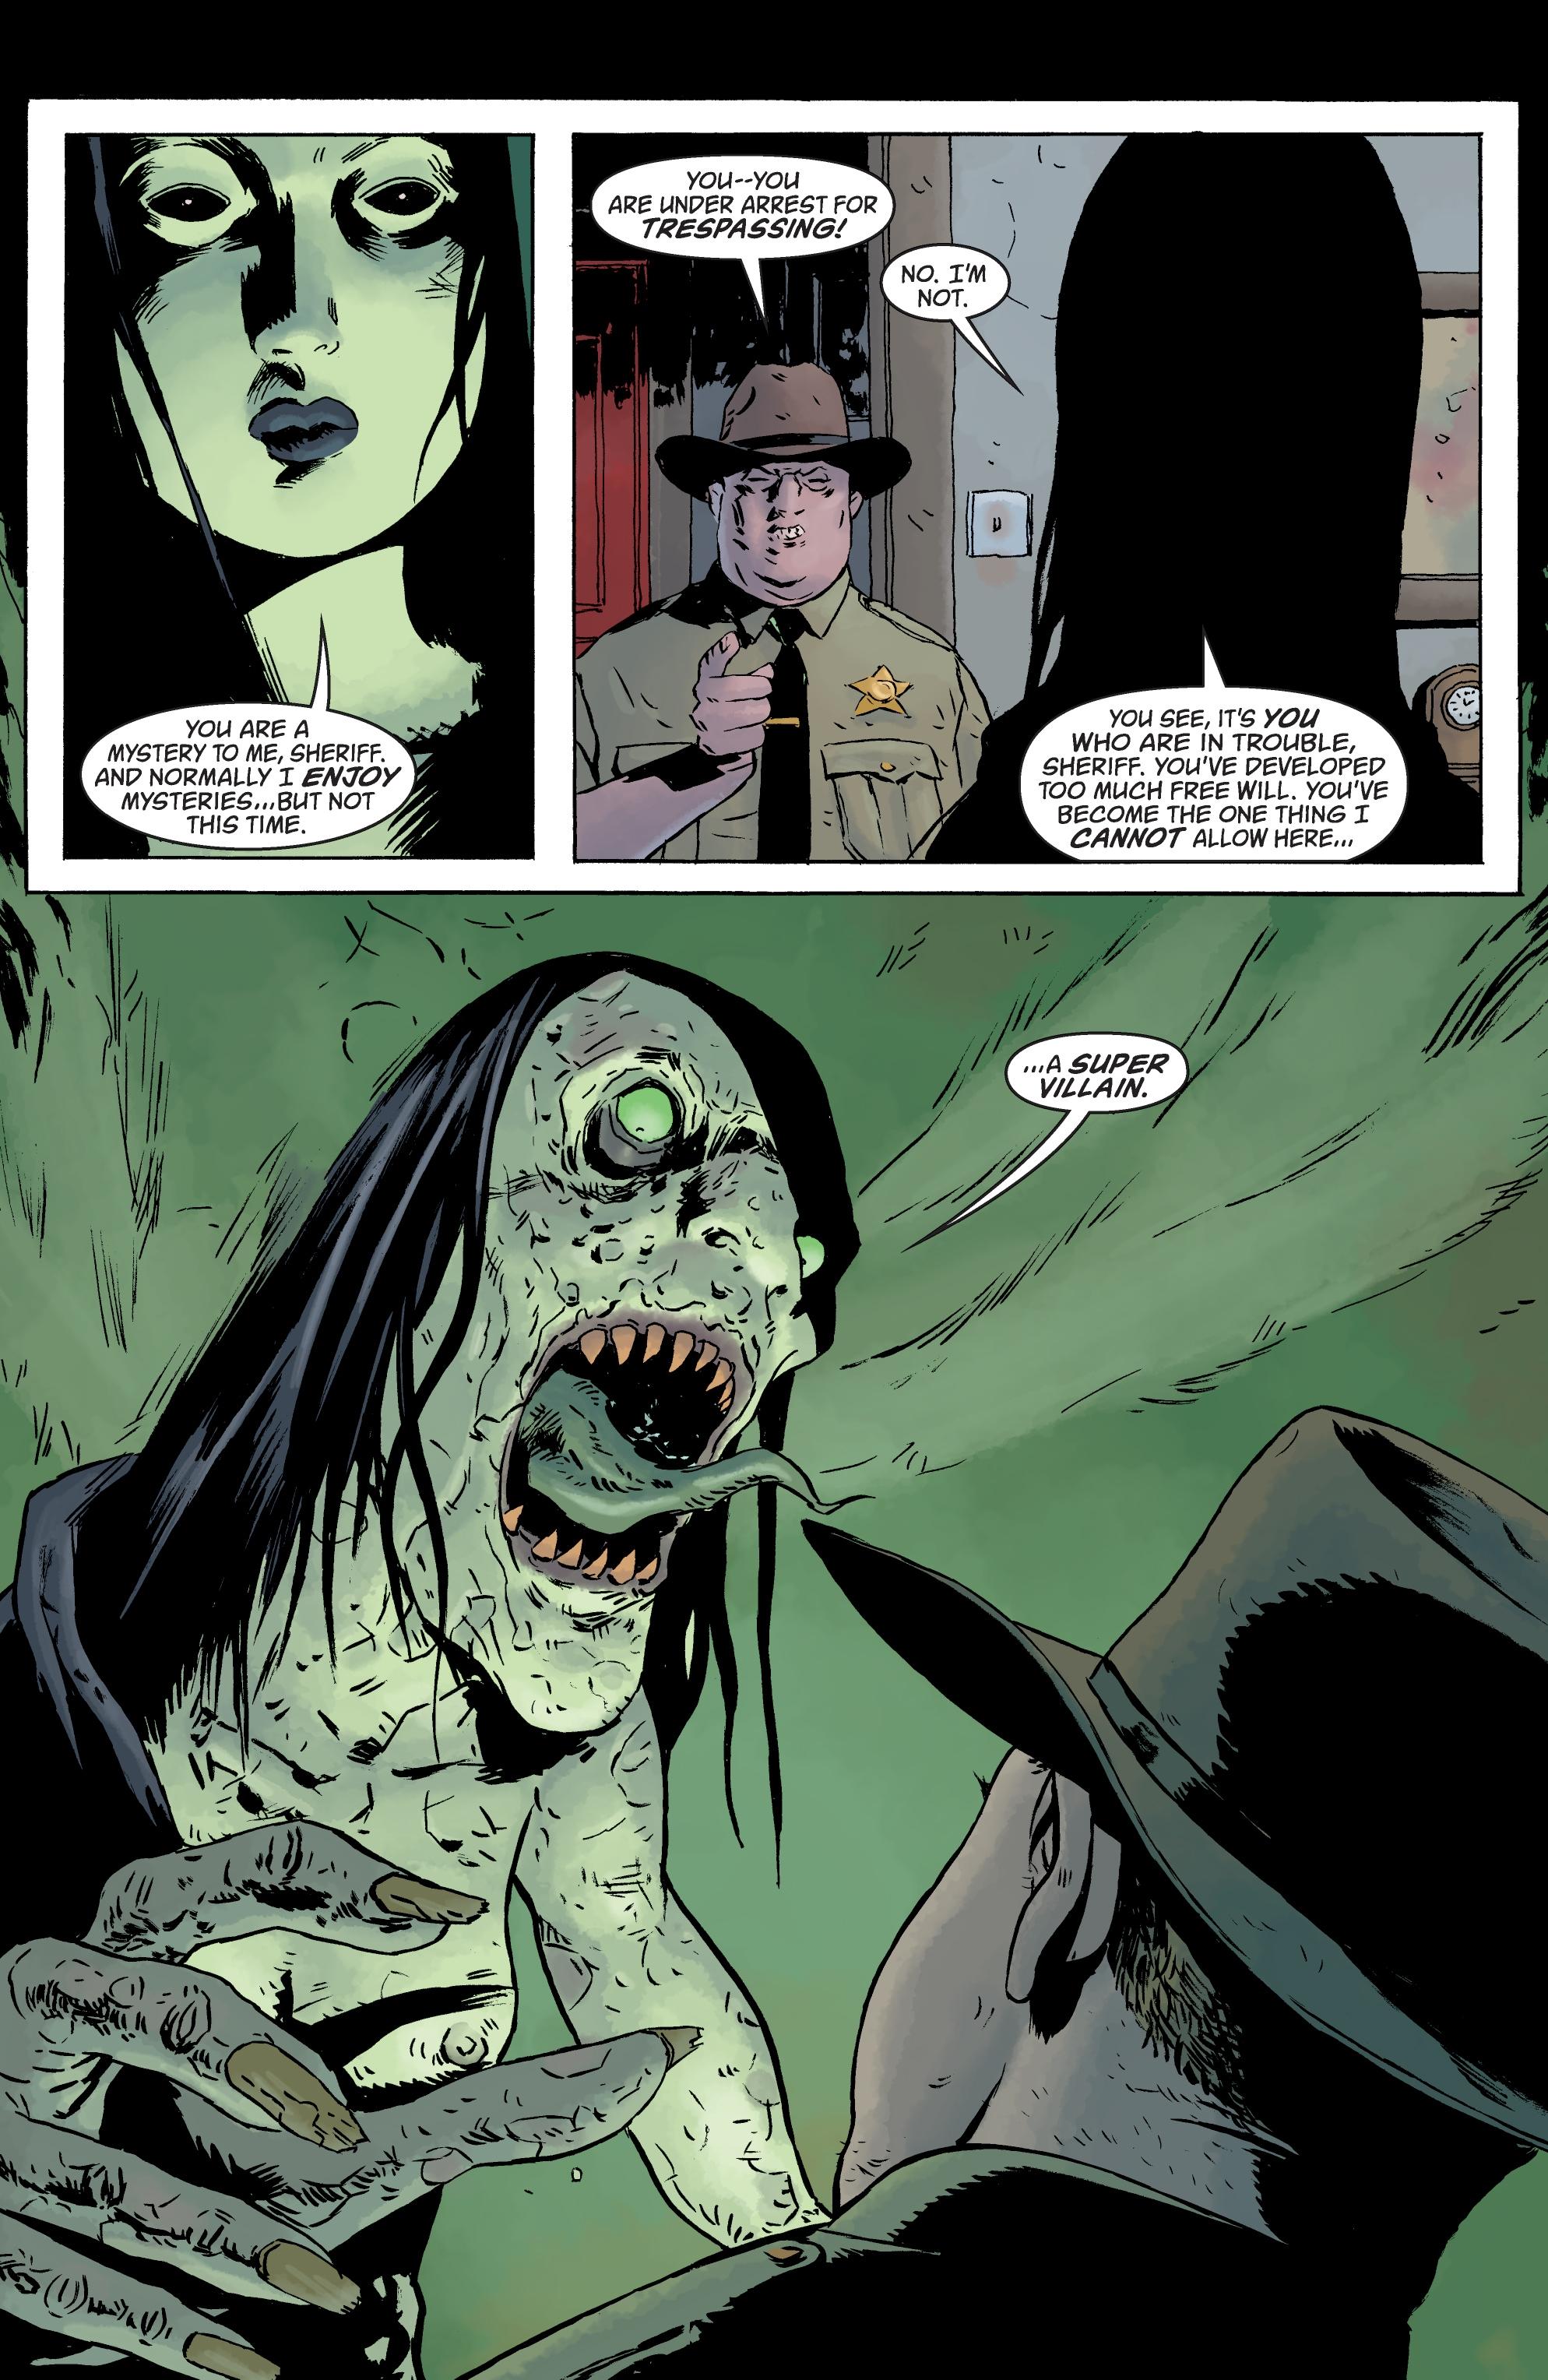 Read online Black Hammer comic -  Issue #10 - 24